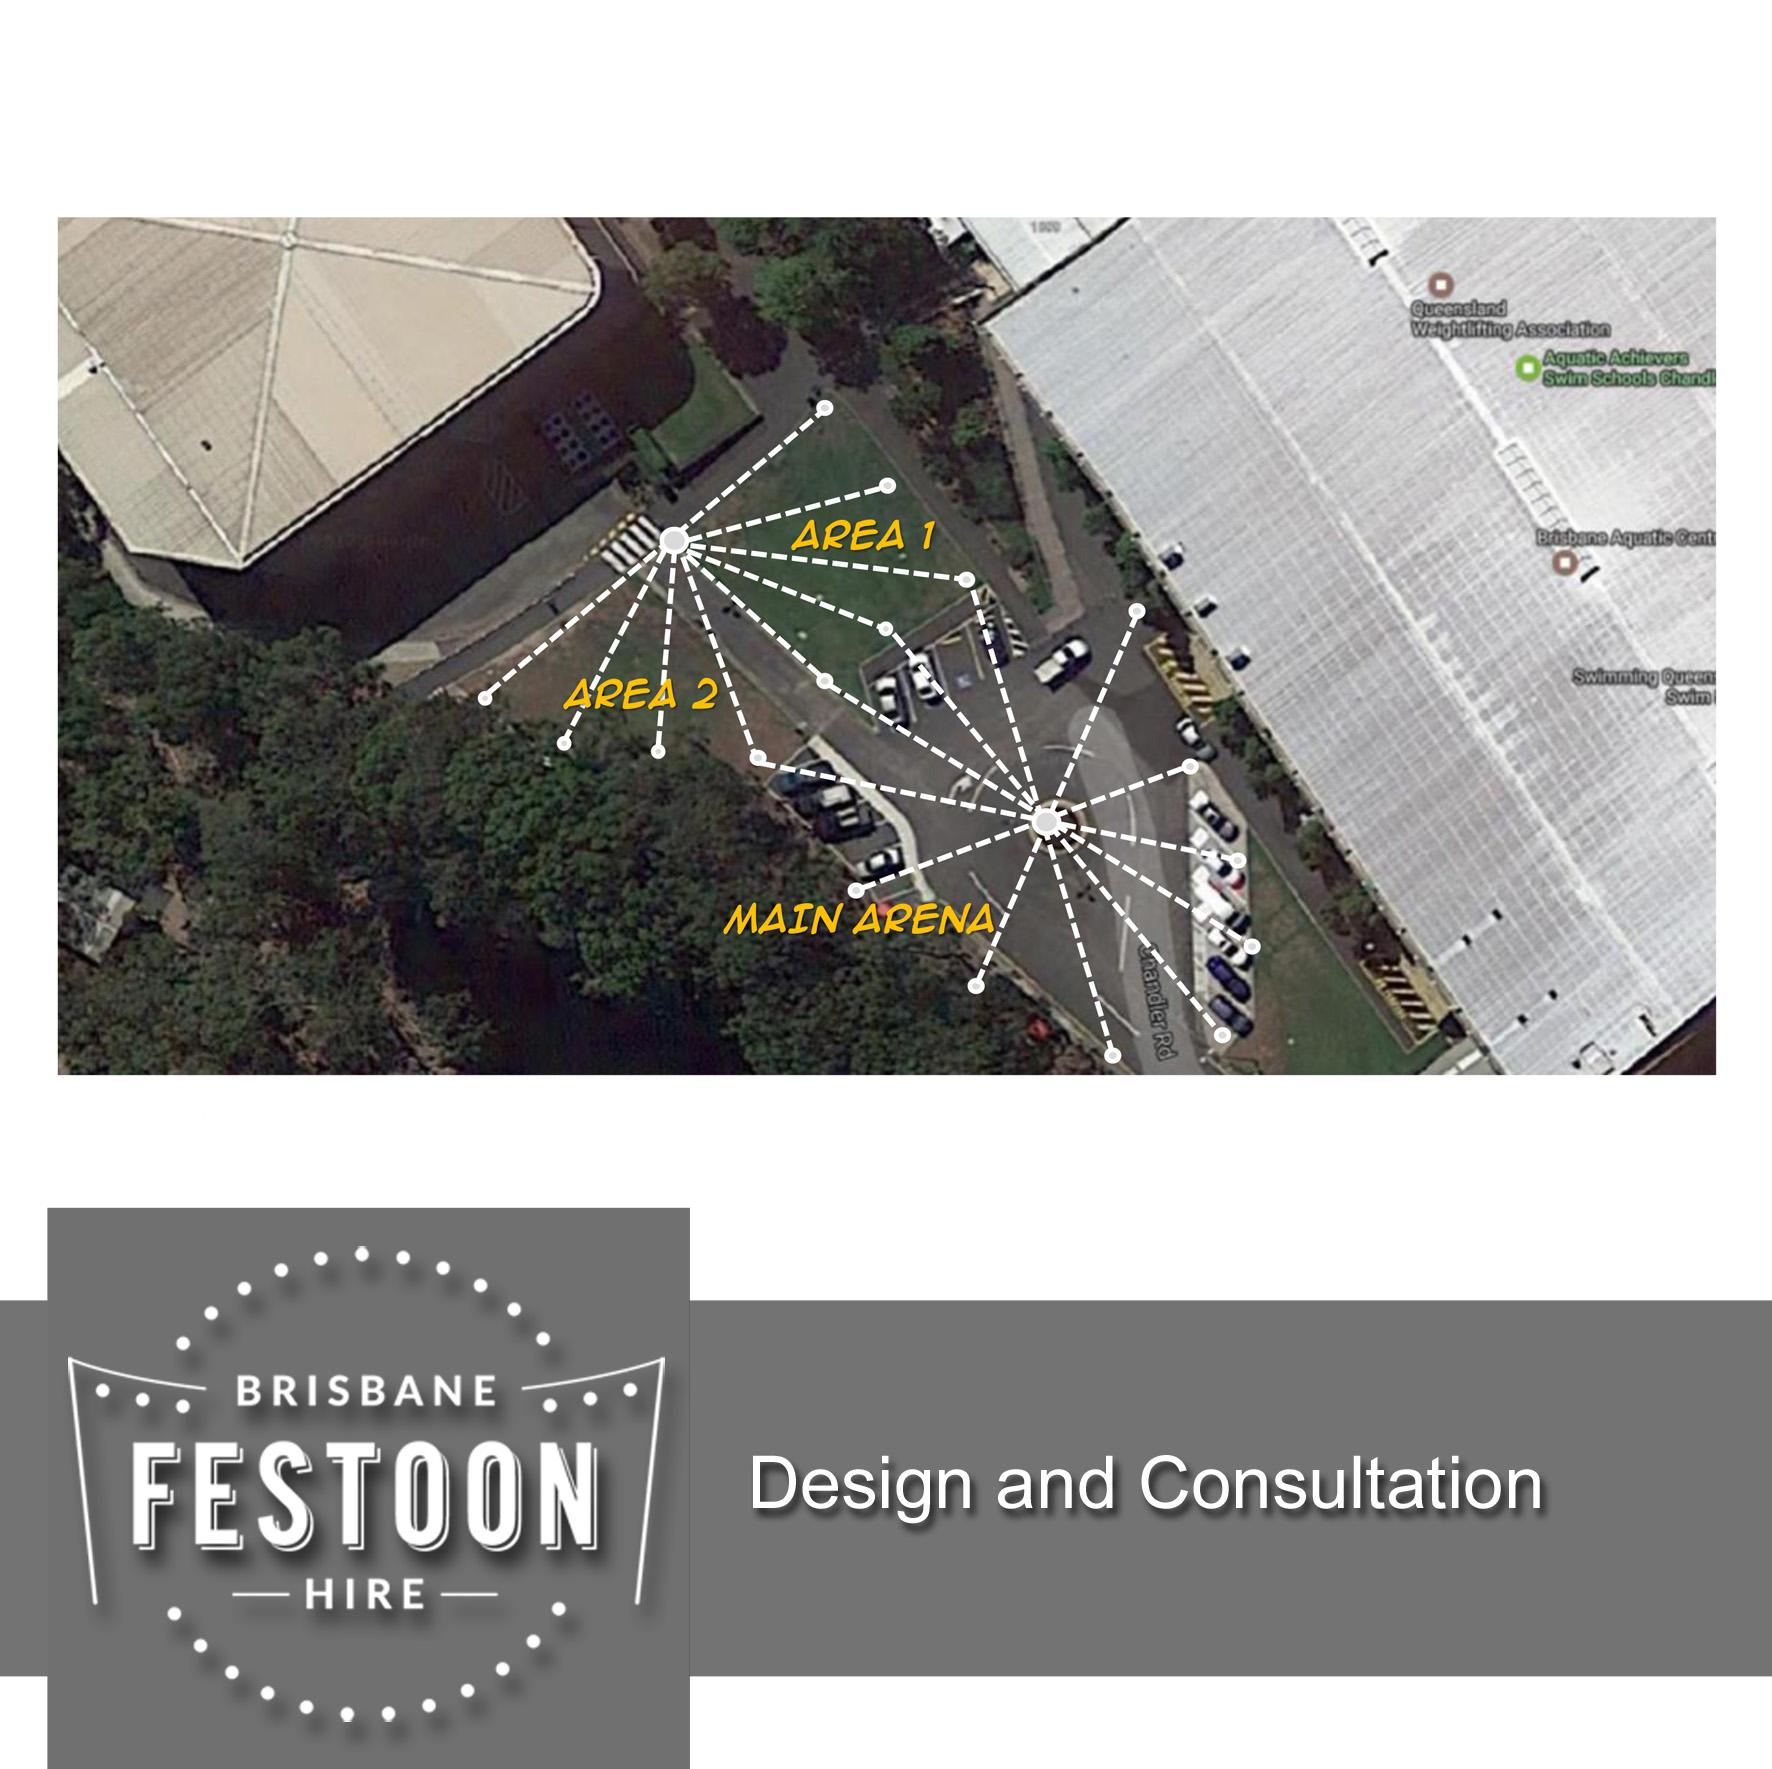 Brisbane Festoon Hire - Design and Consultation BLK 1.jpg